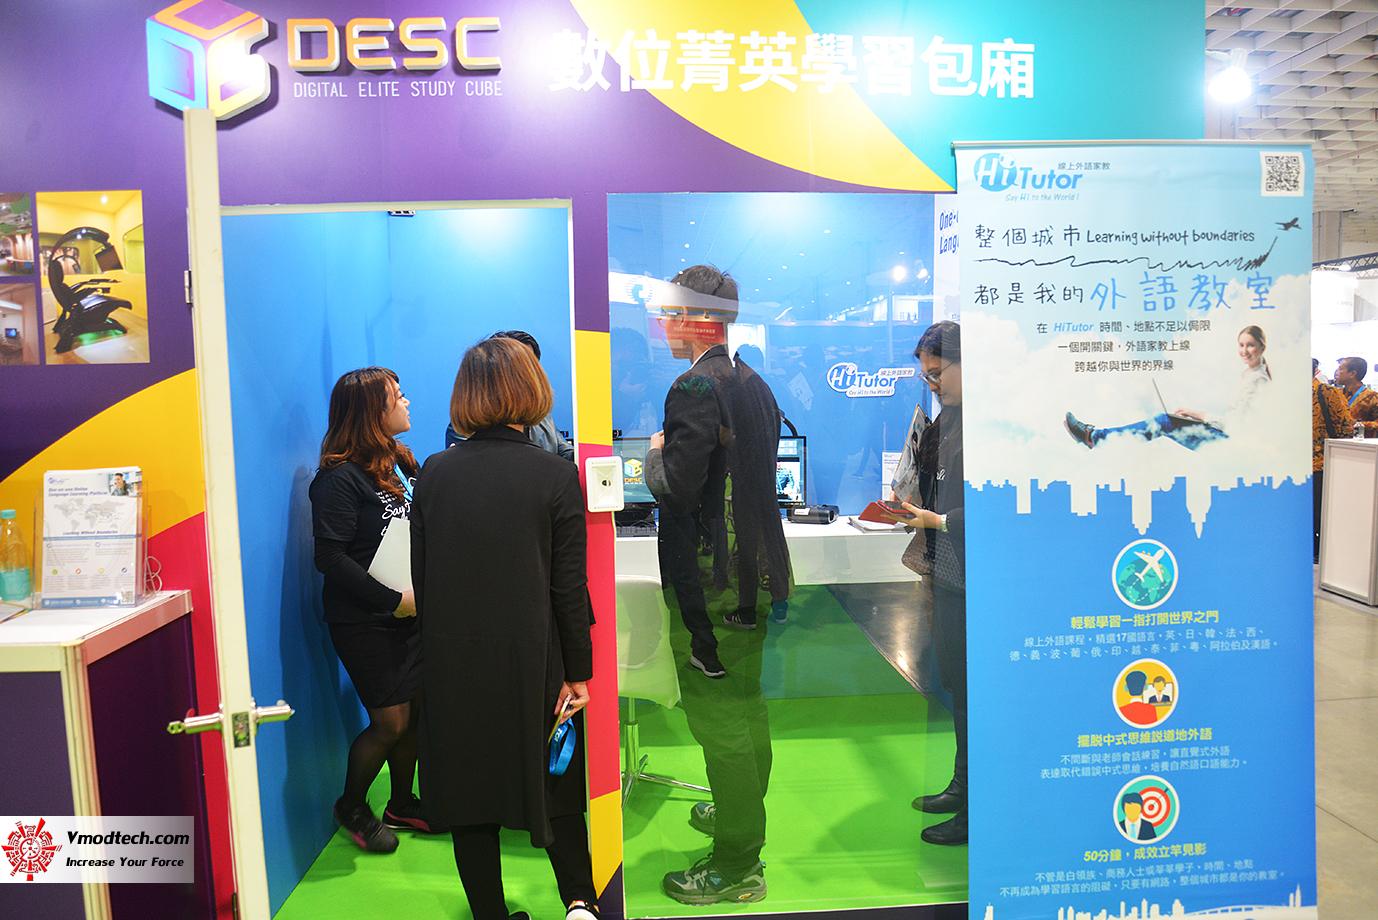 dsc 8658 เยี่ยมชมบูธ Smart Education ระบบการศึกษาอัจฉริยะในงาน 2019 SMART CITY SUMMIT & EXPO ณ กรุงไทเป ประเทศไต้หวัน